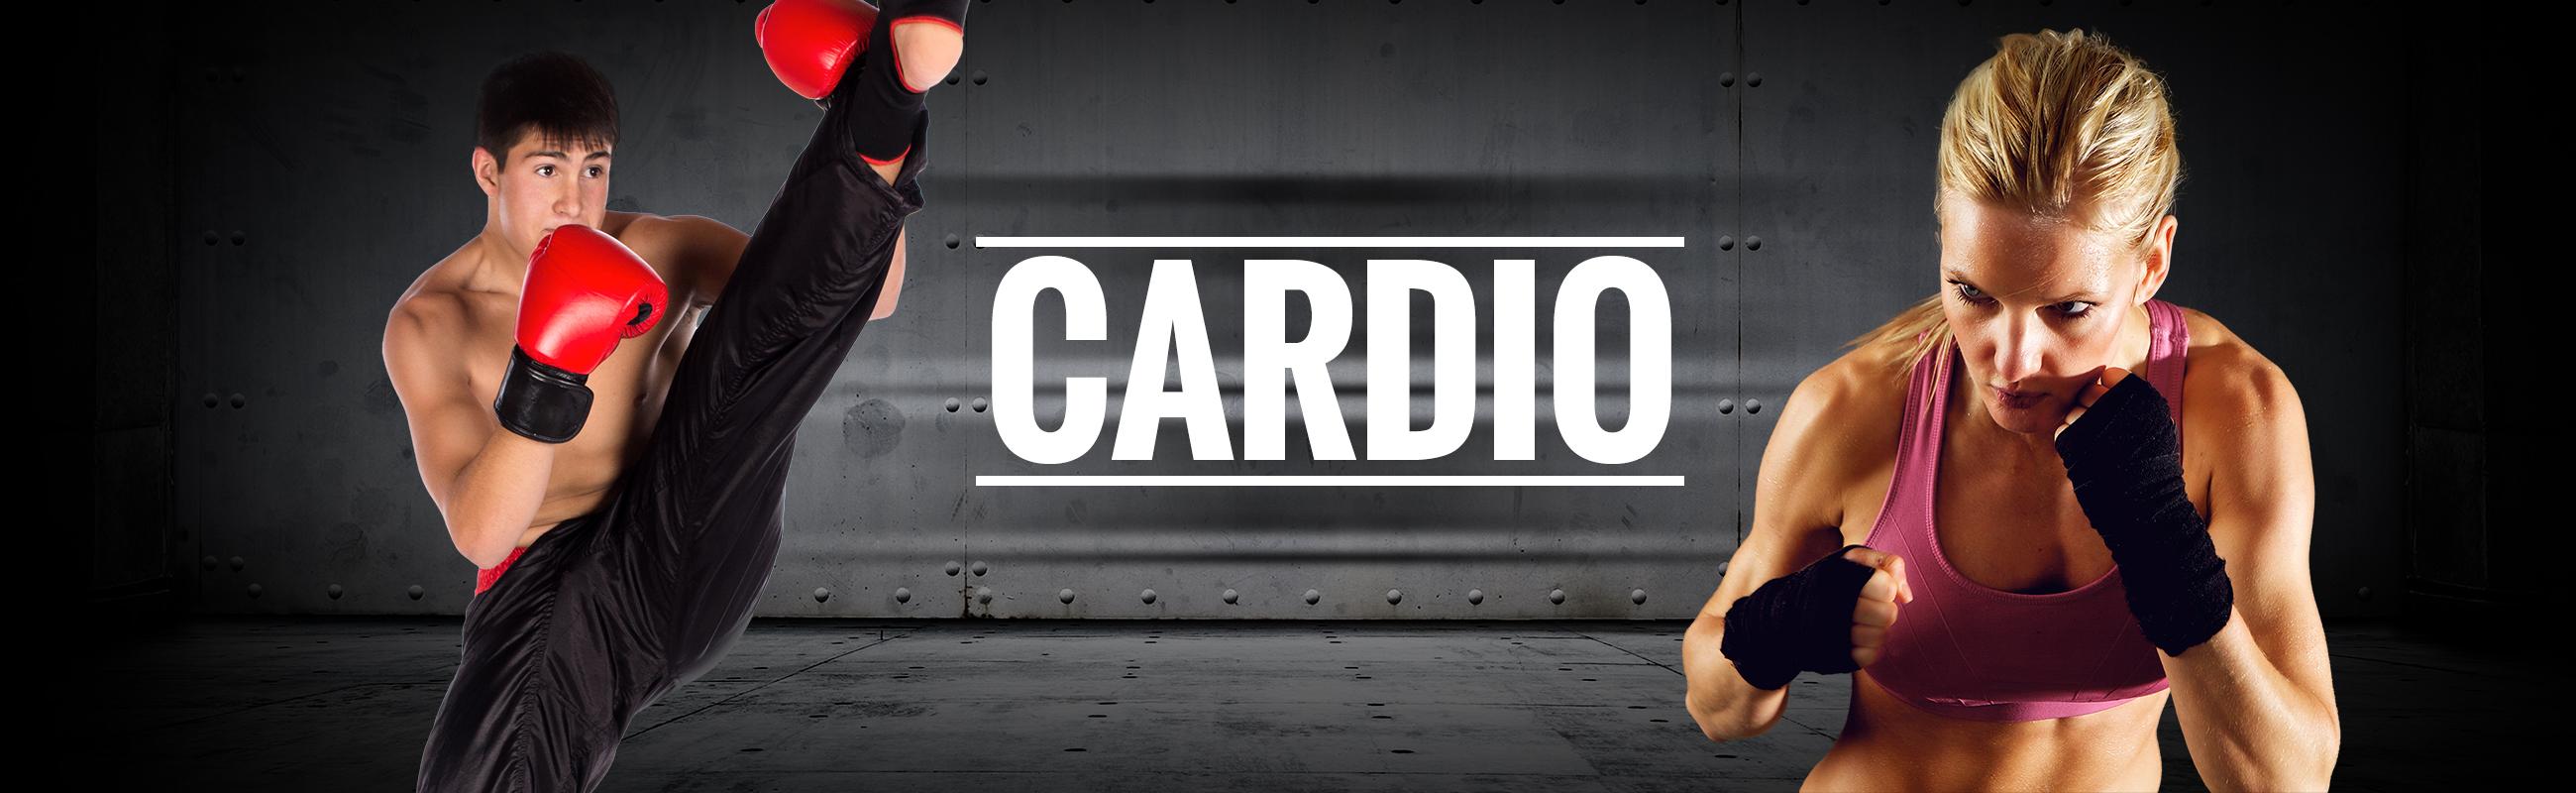 slider-cardio